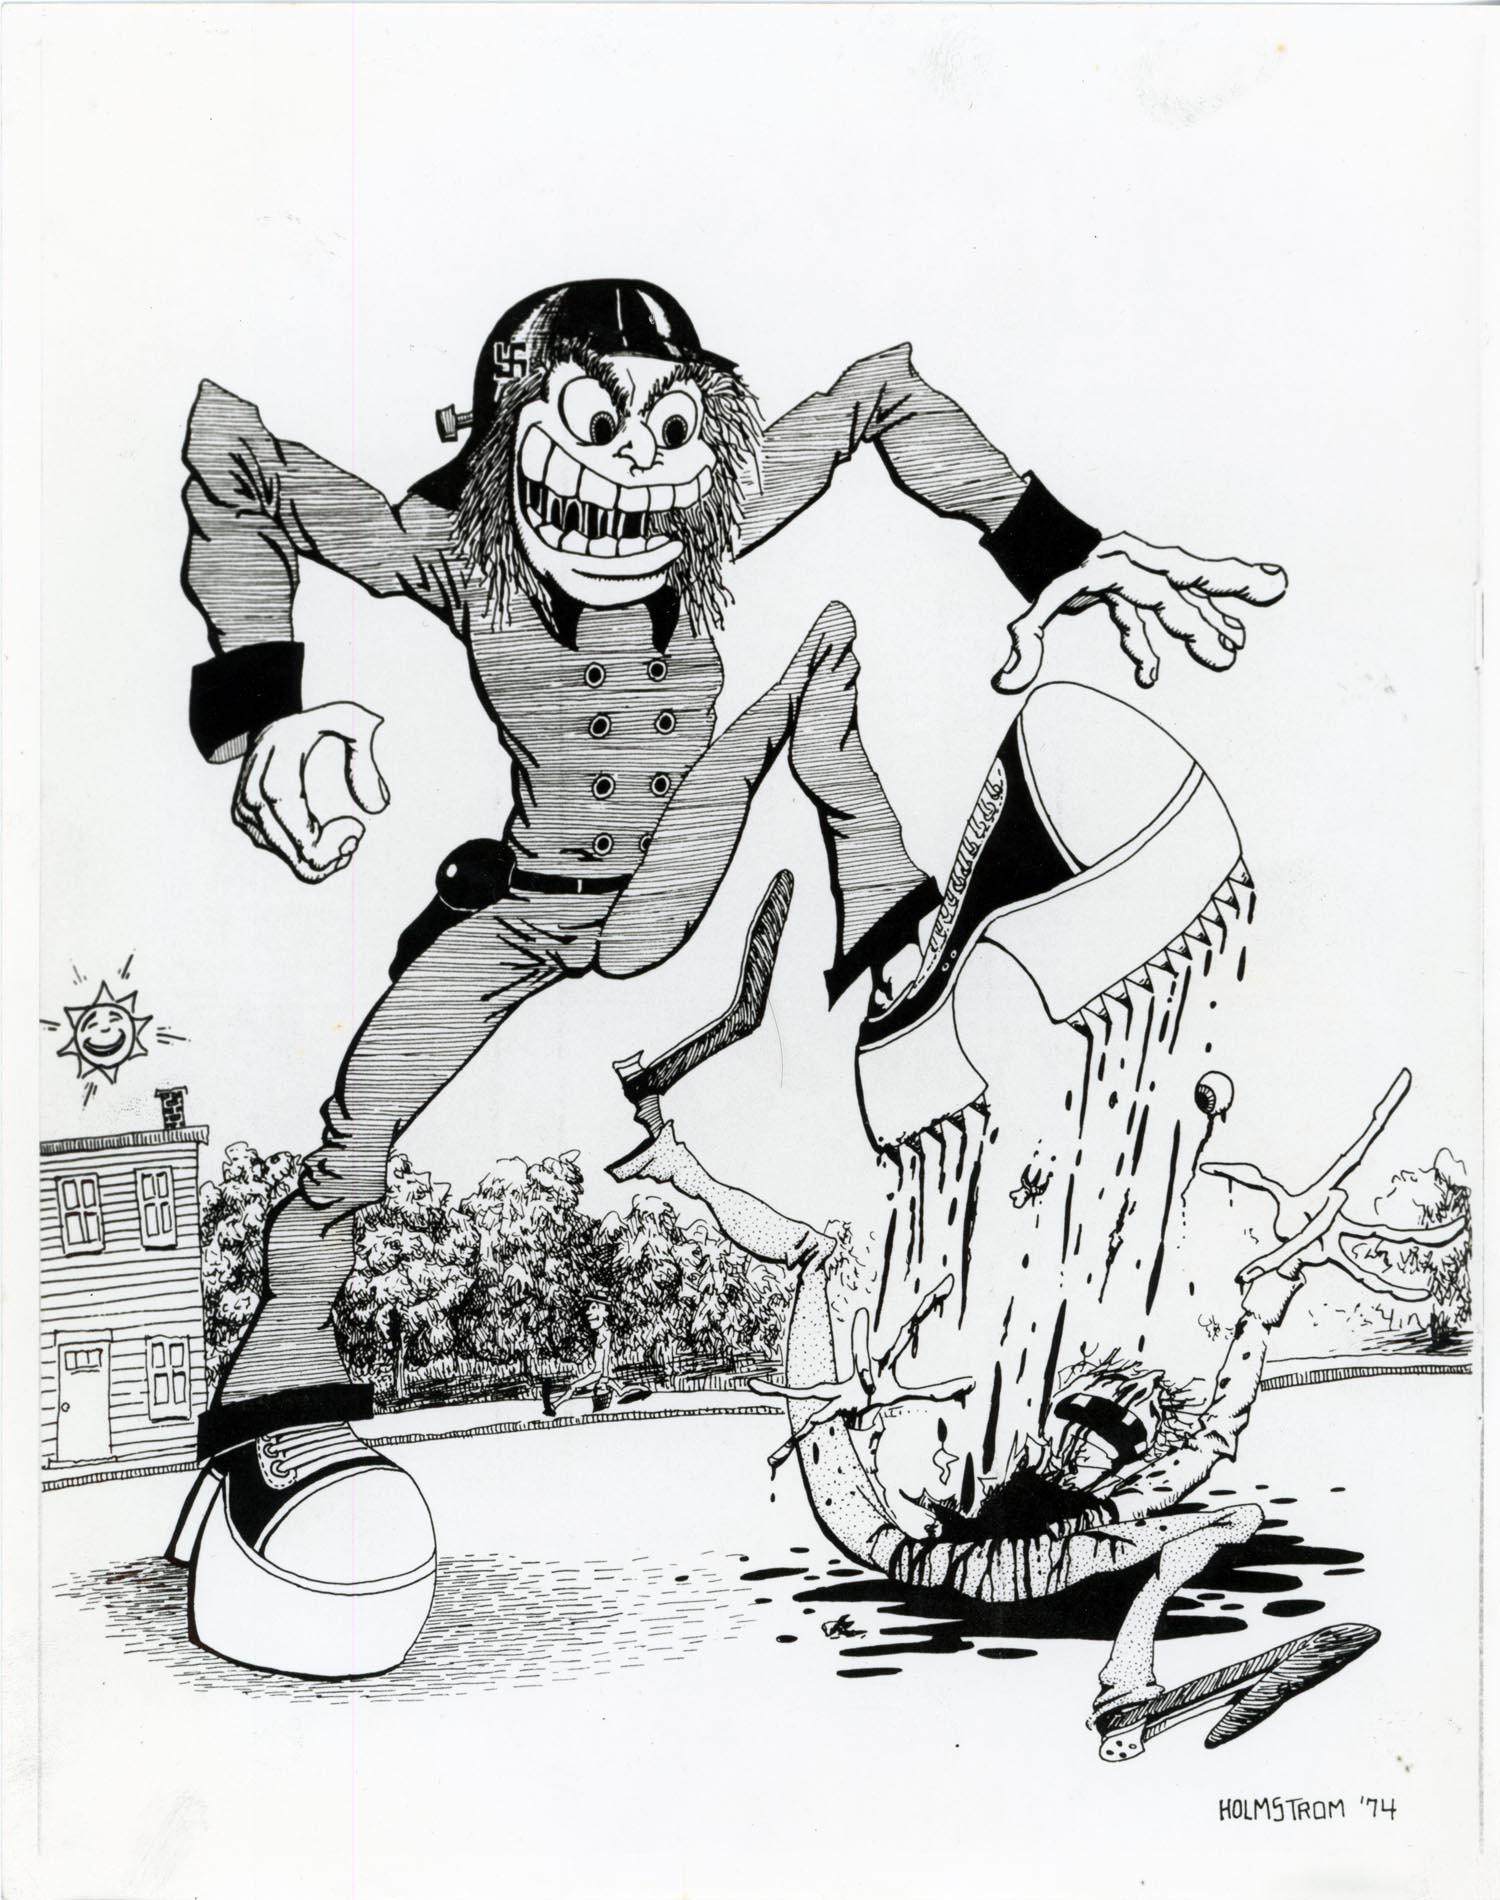 John Holstrom, Cartoon from  Punk Magazine  #7, 1977